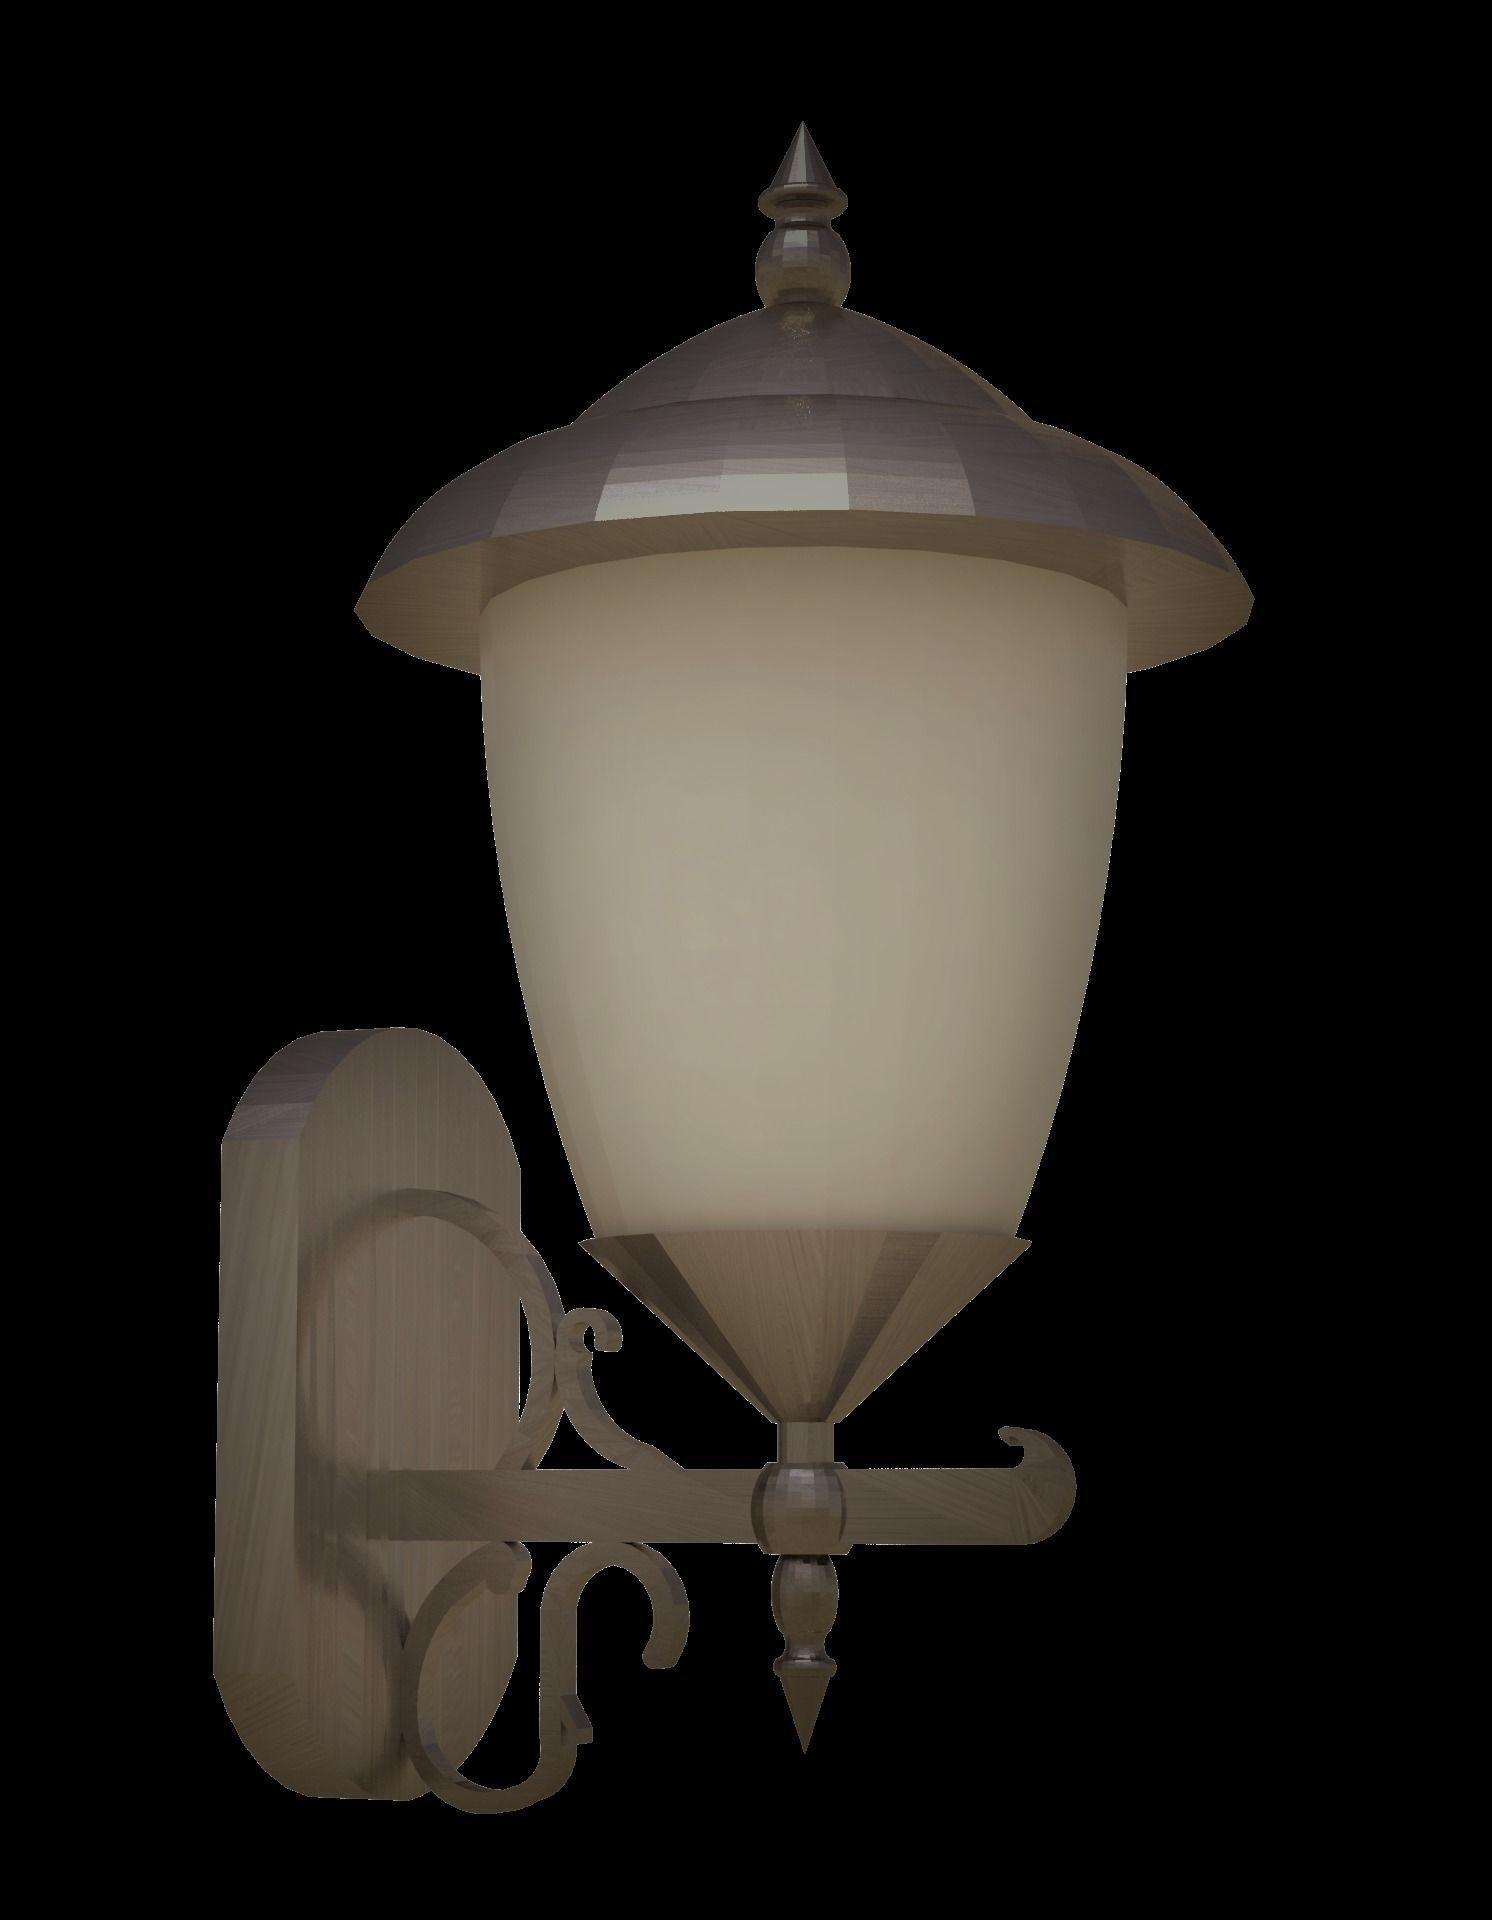 Wall Hung Light Fixture Model Low Poly Obj Mtl S Fbx Stl M 1